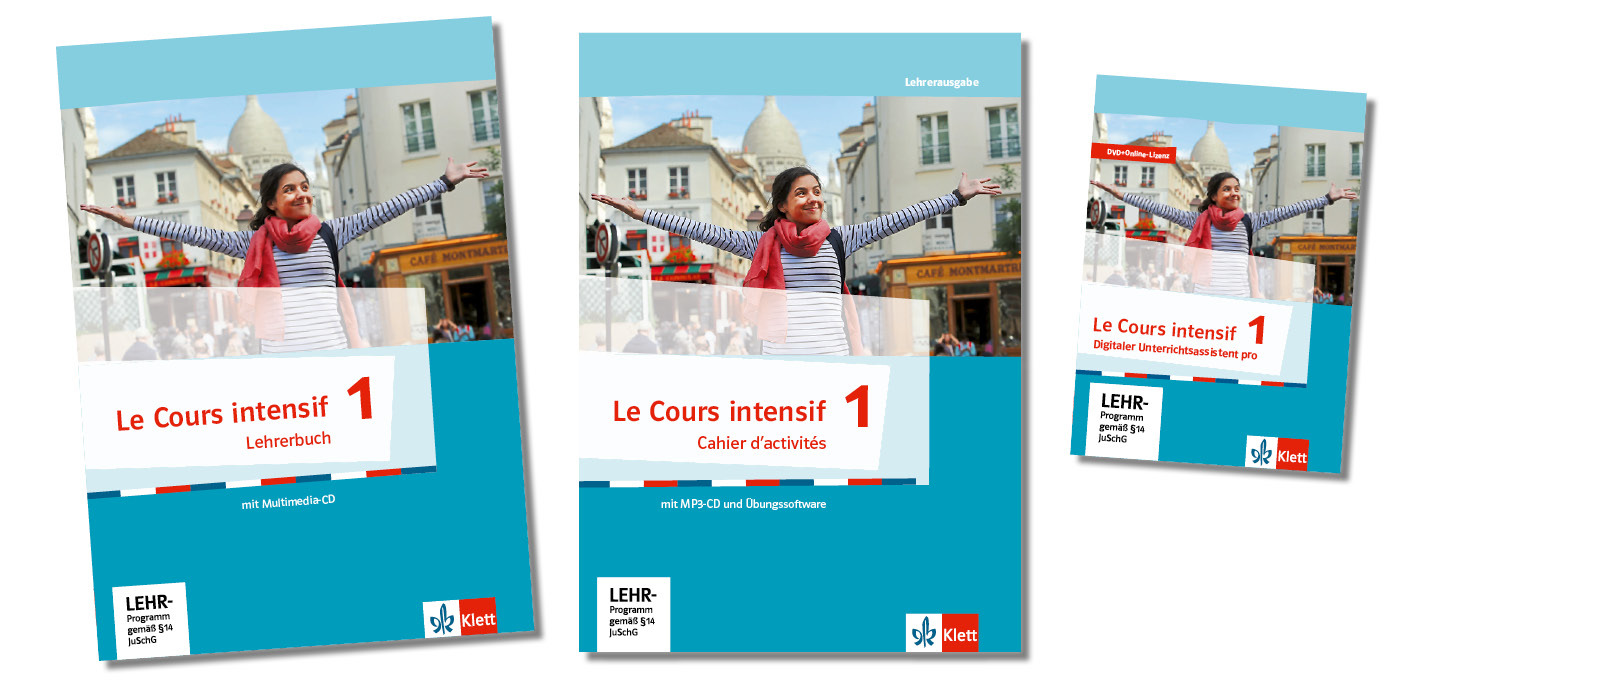 Teaser lehrwerksteile lehrerbuch cahier digital le cours intensif 1 klett und balmer